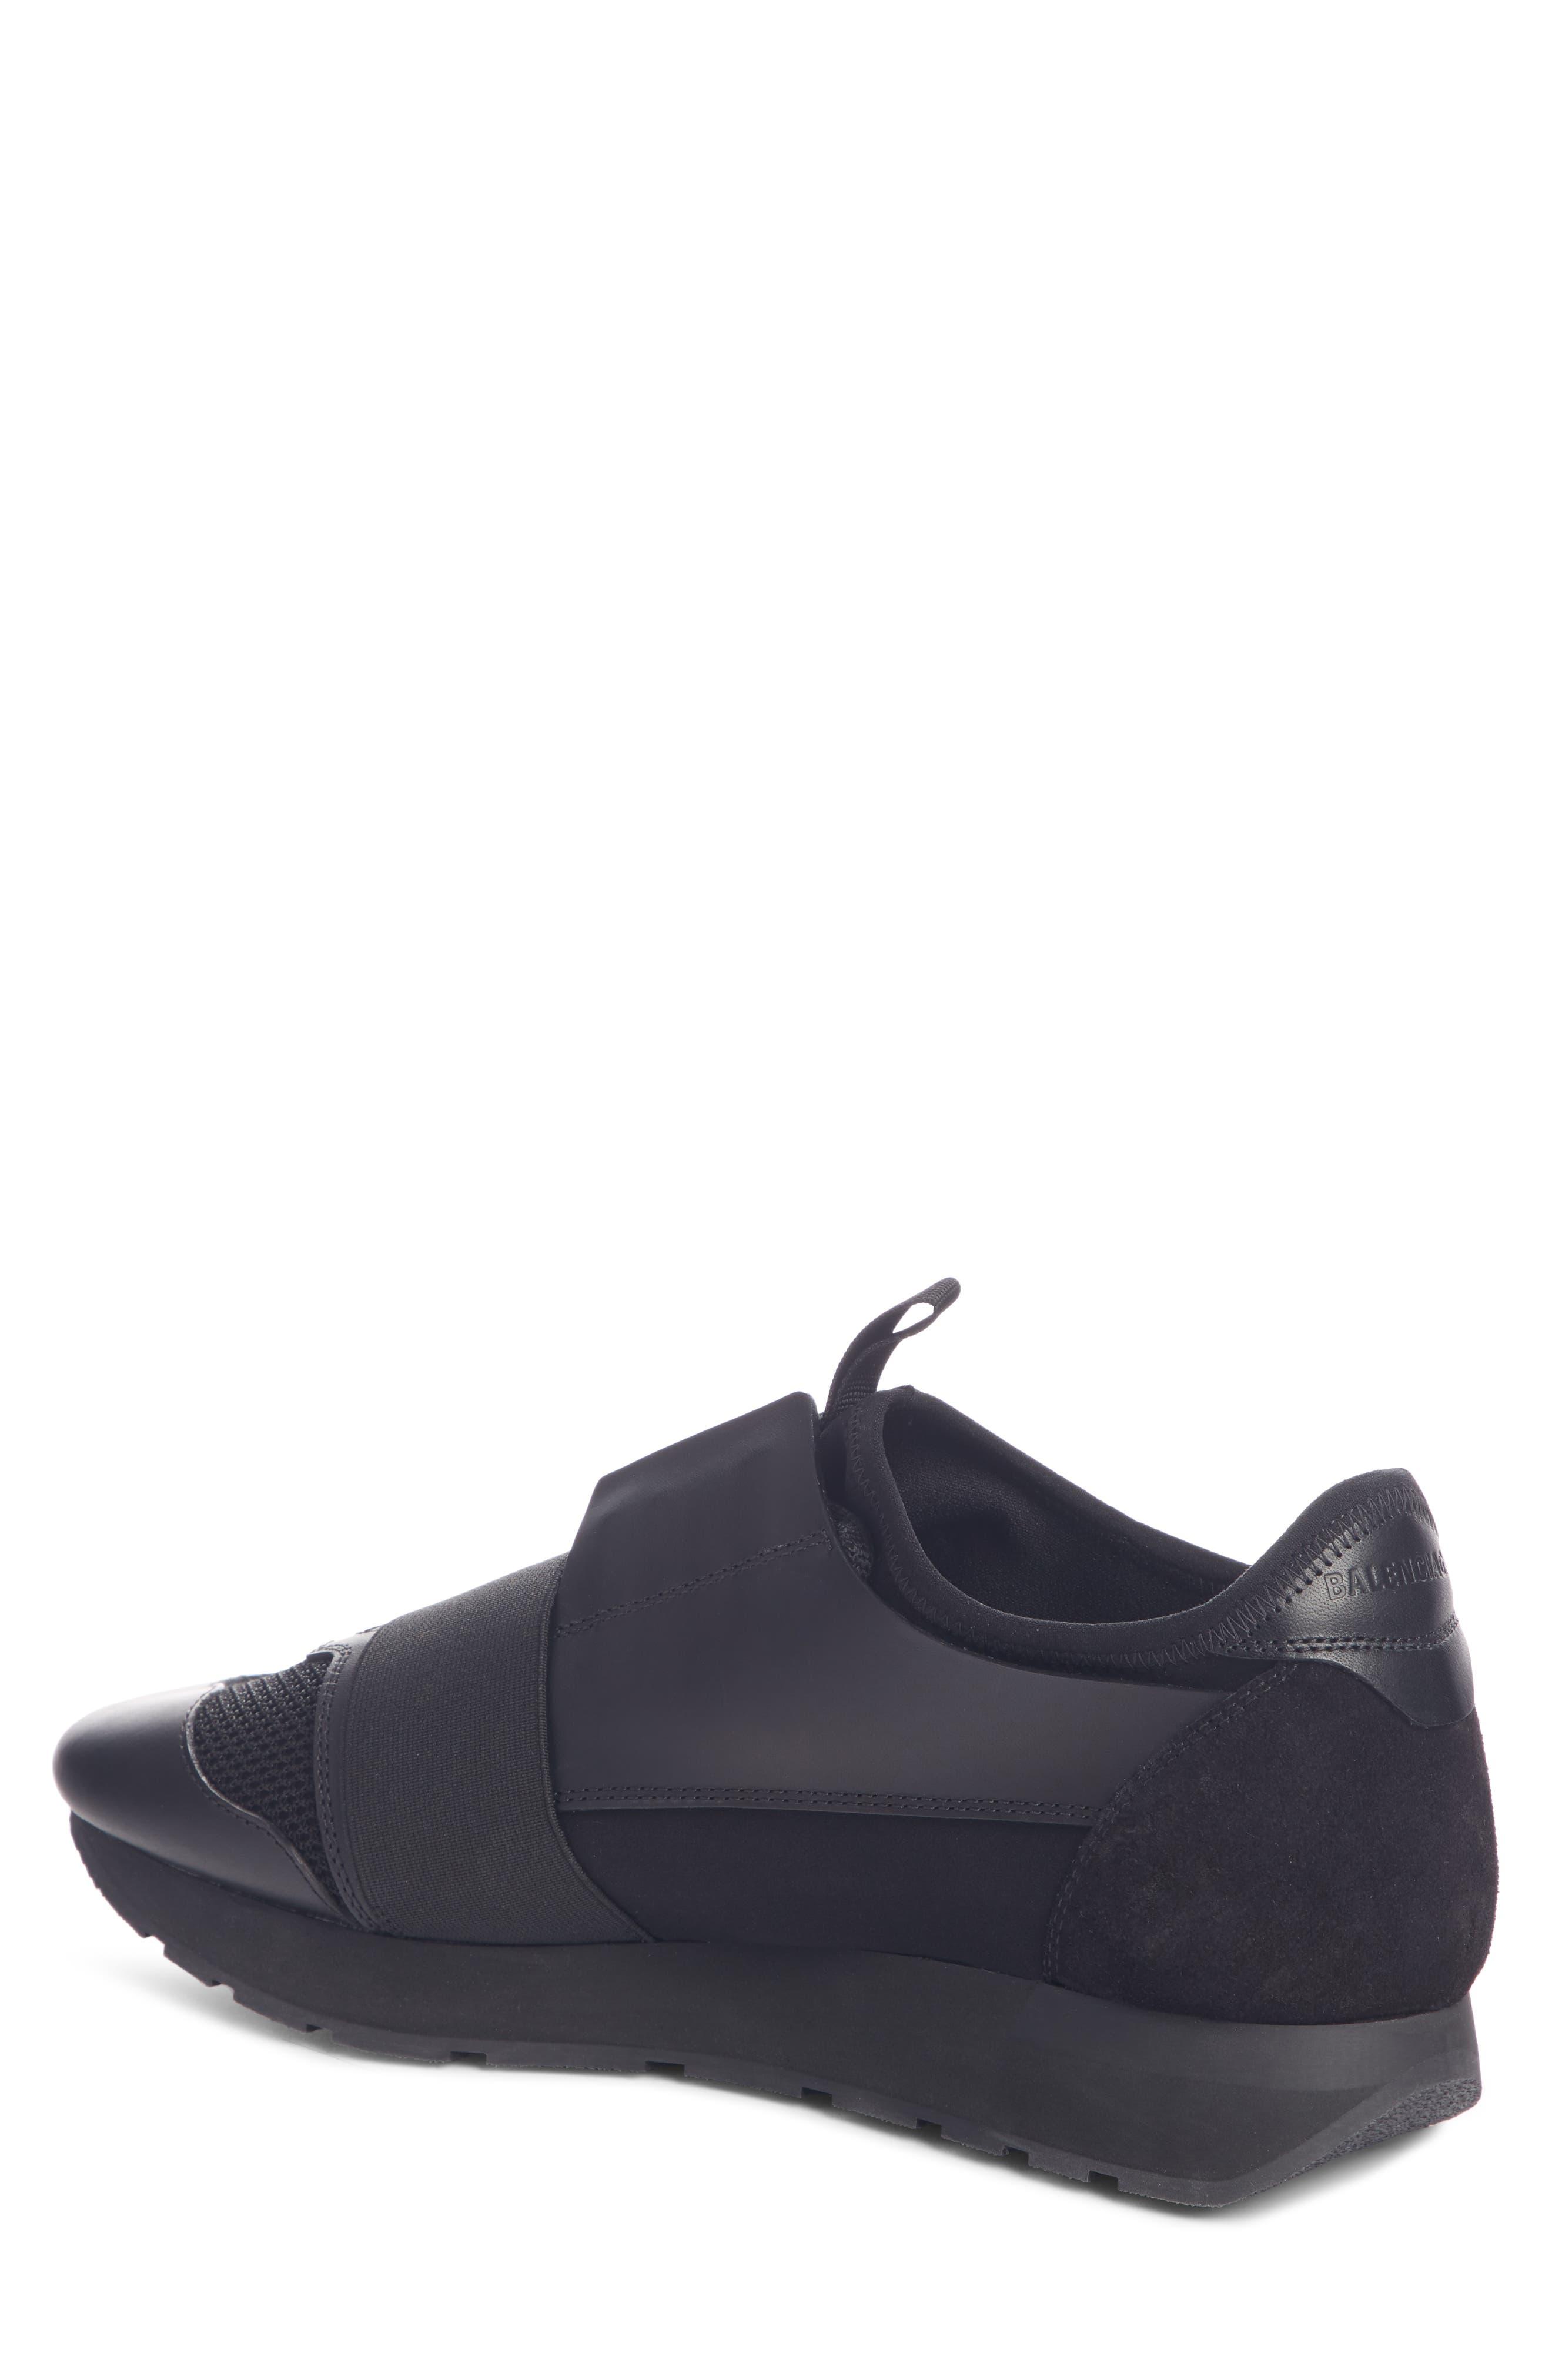 BALENCIAGA, Race Runner Sneaker, Alternate thumbnail 2, color, BLACK/ BLACK/ BLACK